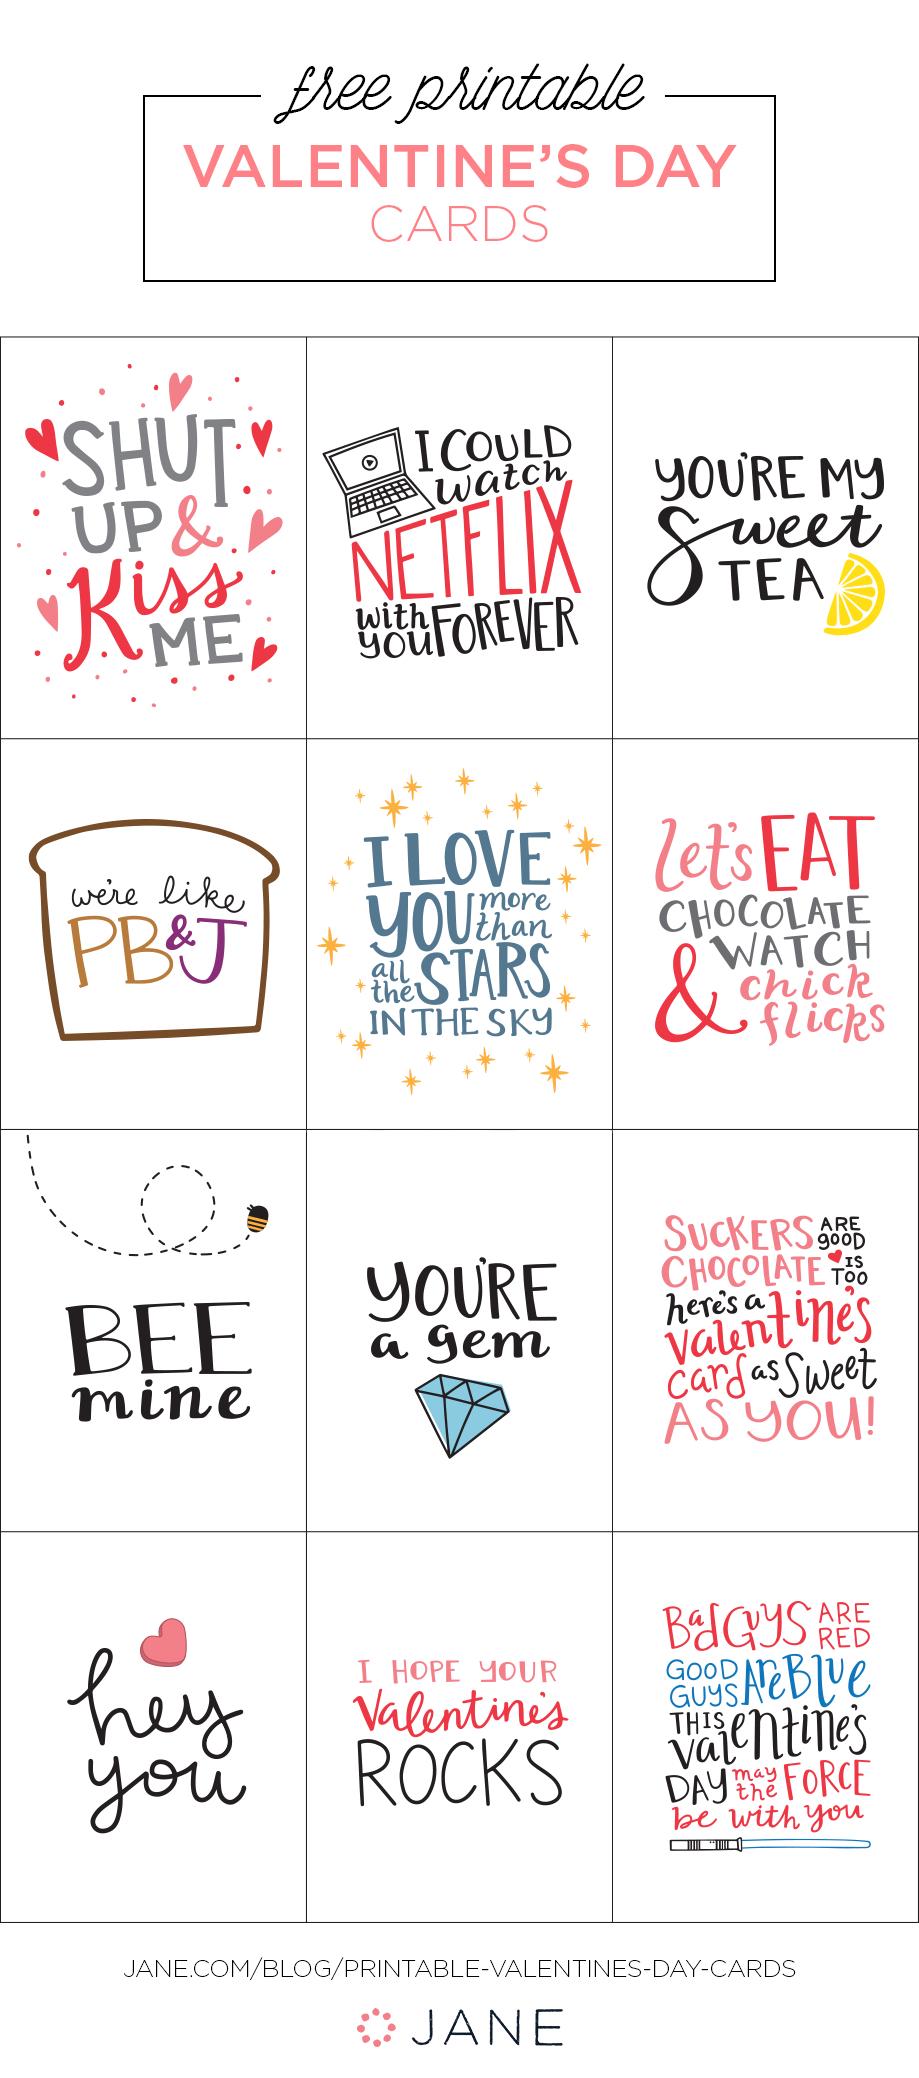 50+ Easy Diy And Printable Valentines   Mompop   Printable - Free Printable Valentine Cards For Husband